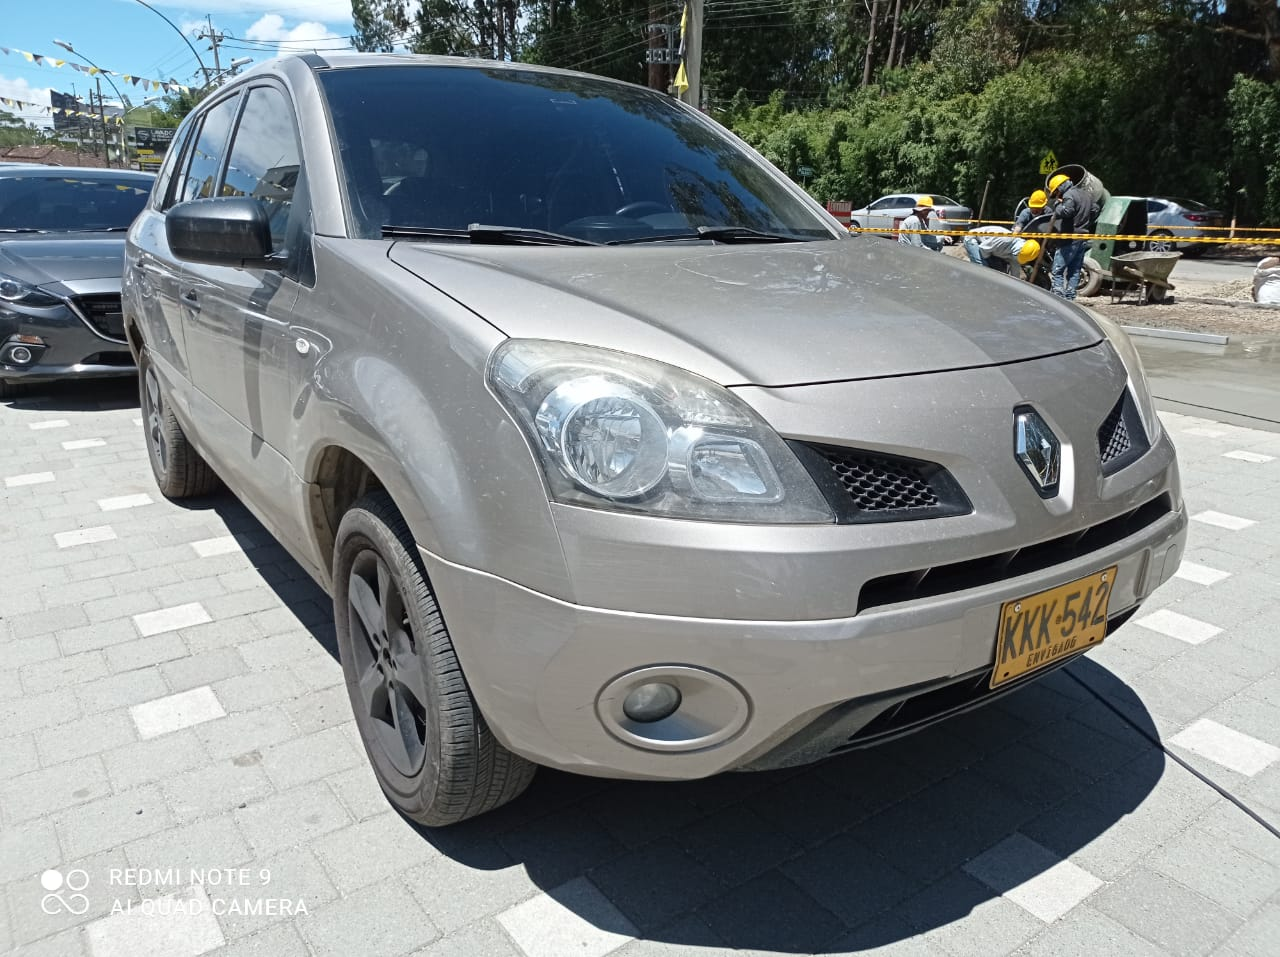 Renault-Koleos-01485413-1